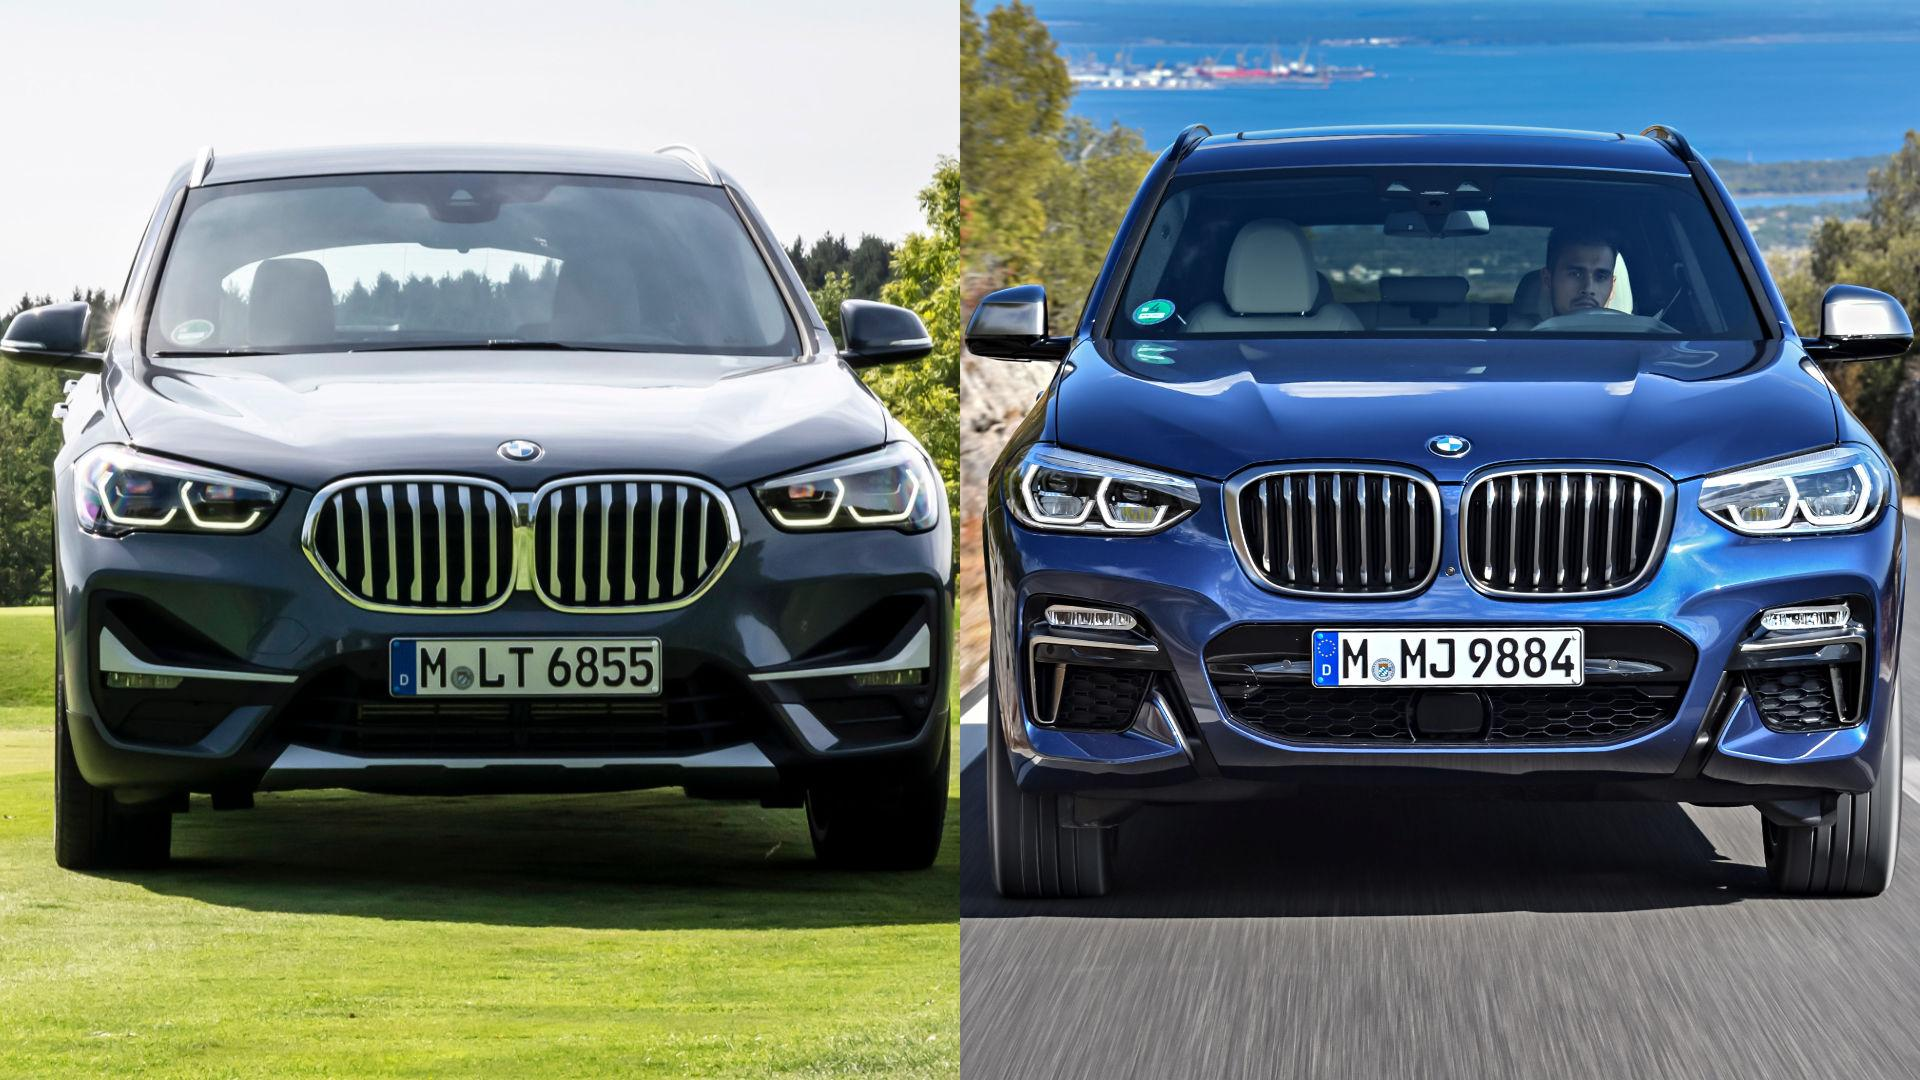 BMW X1 vs X3